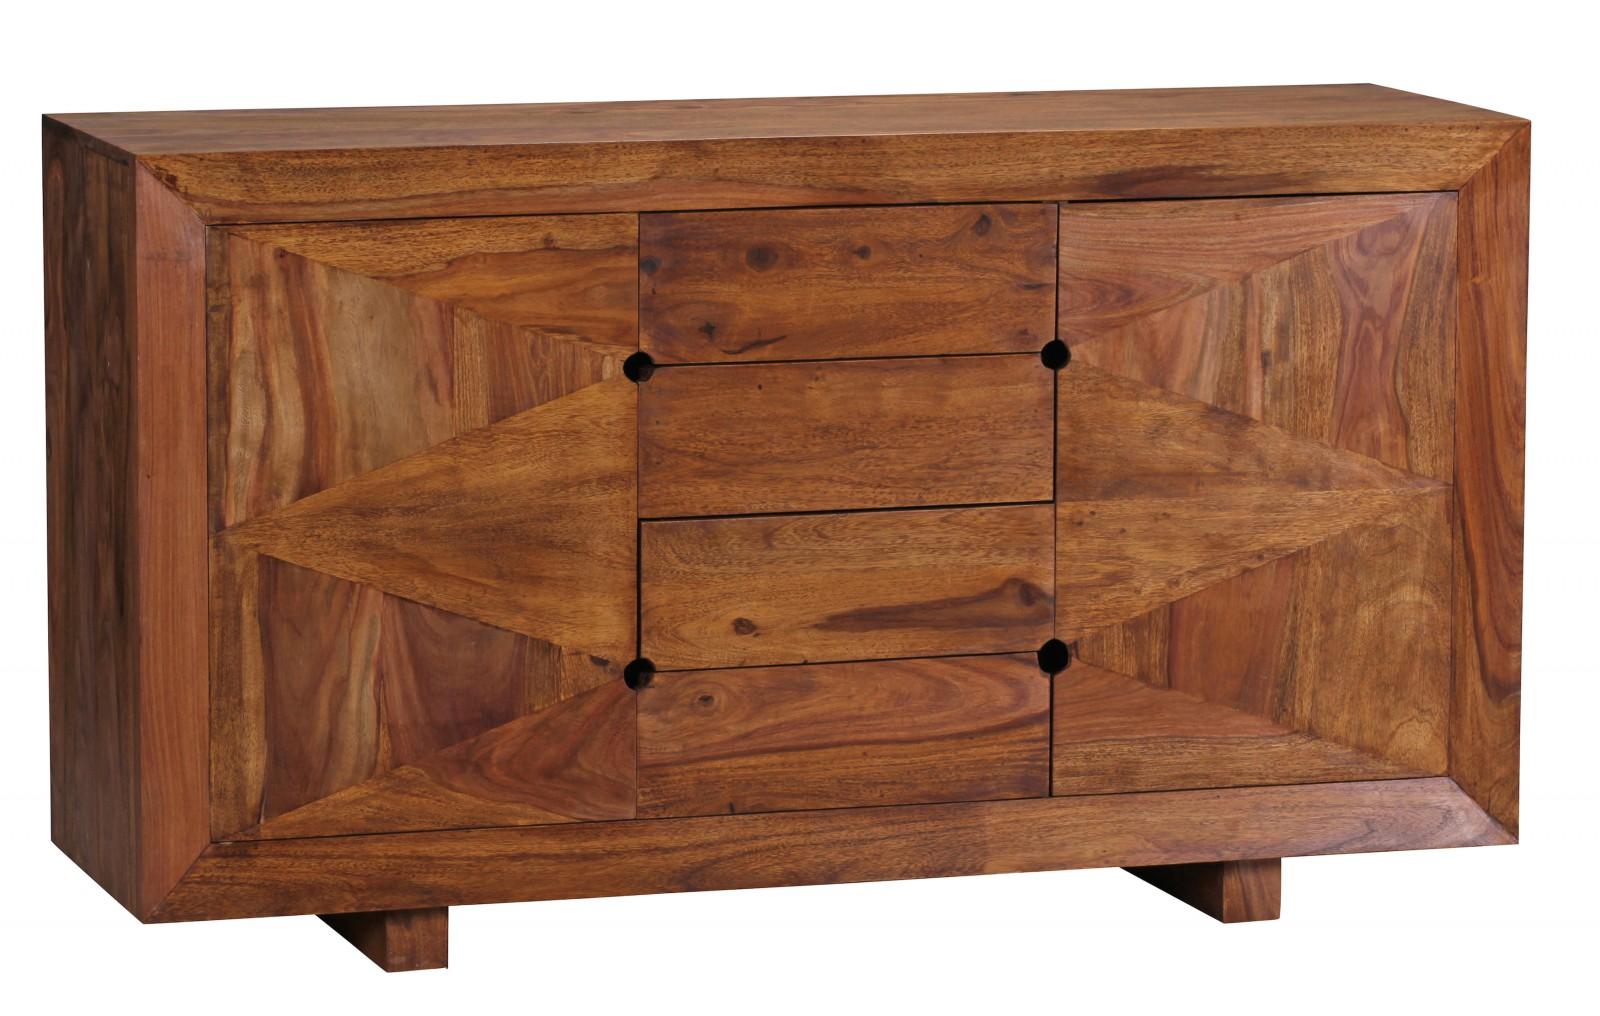 Sheesham Massivholz Sideboard 145 x 45 x 82 cm 2 Türen 4 Schubladen